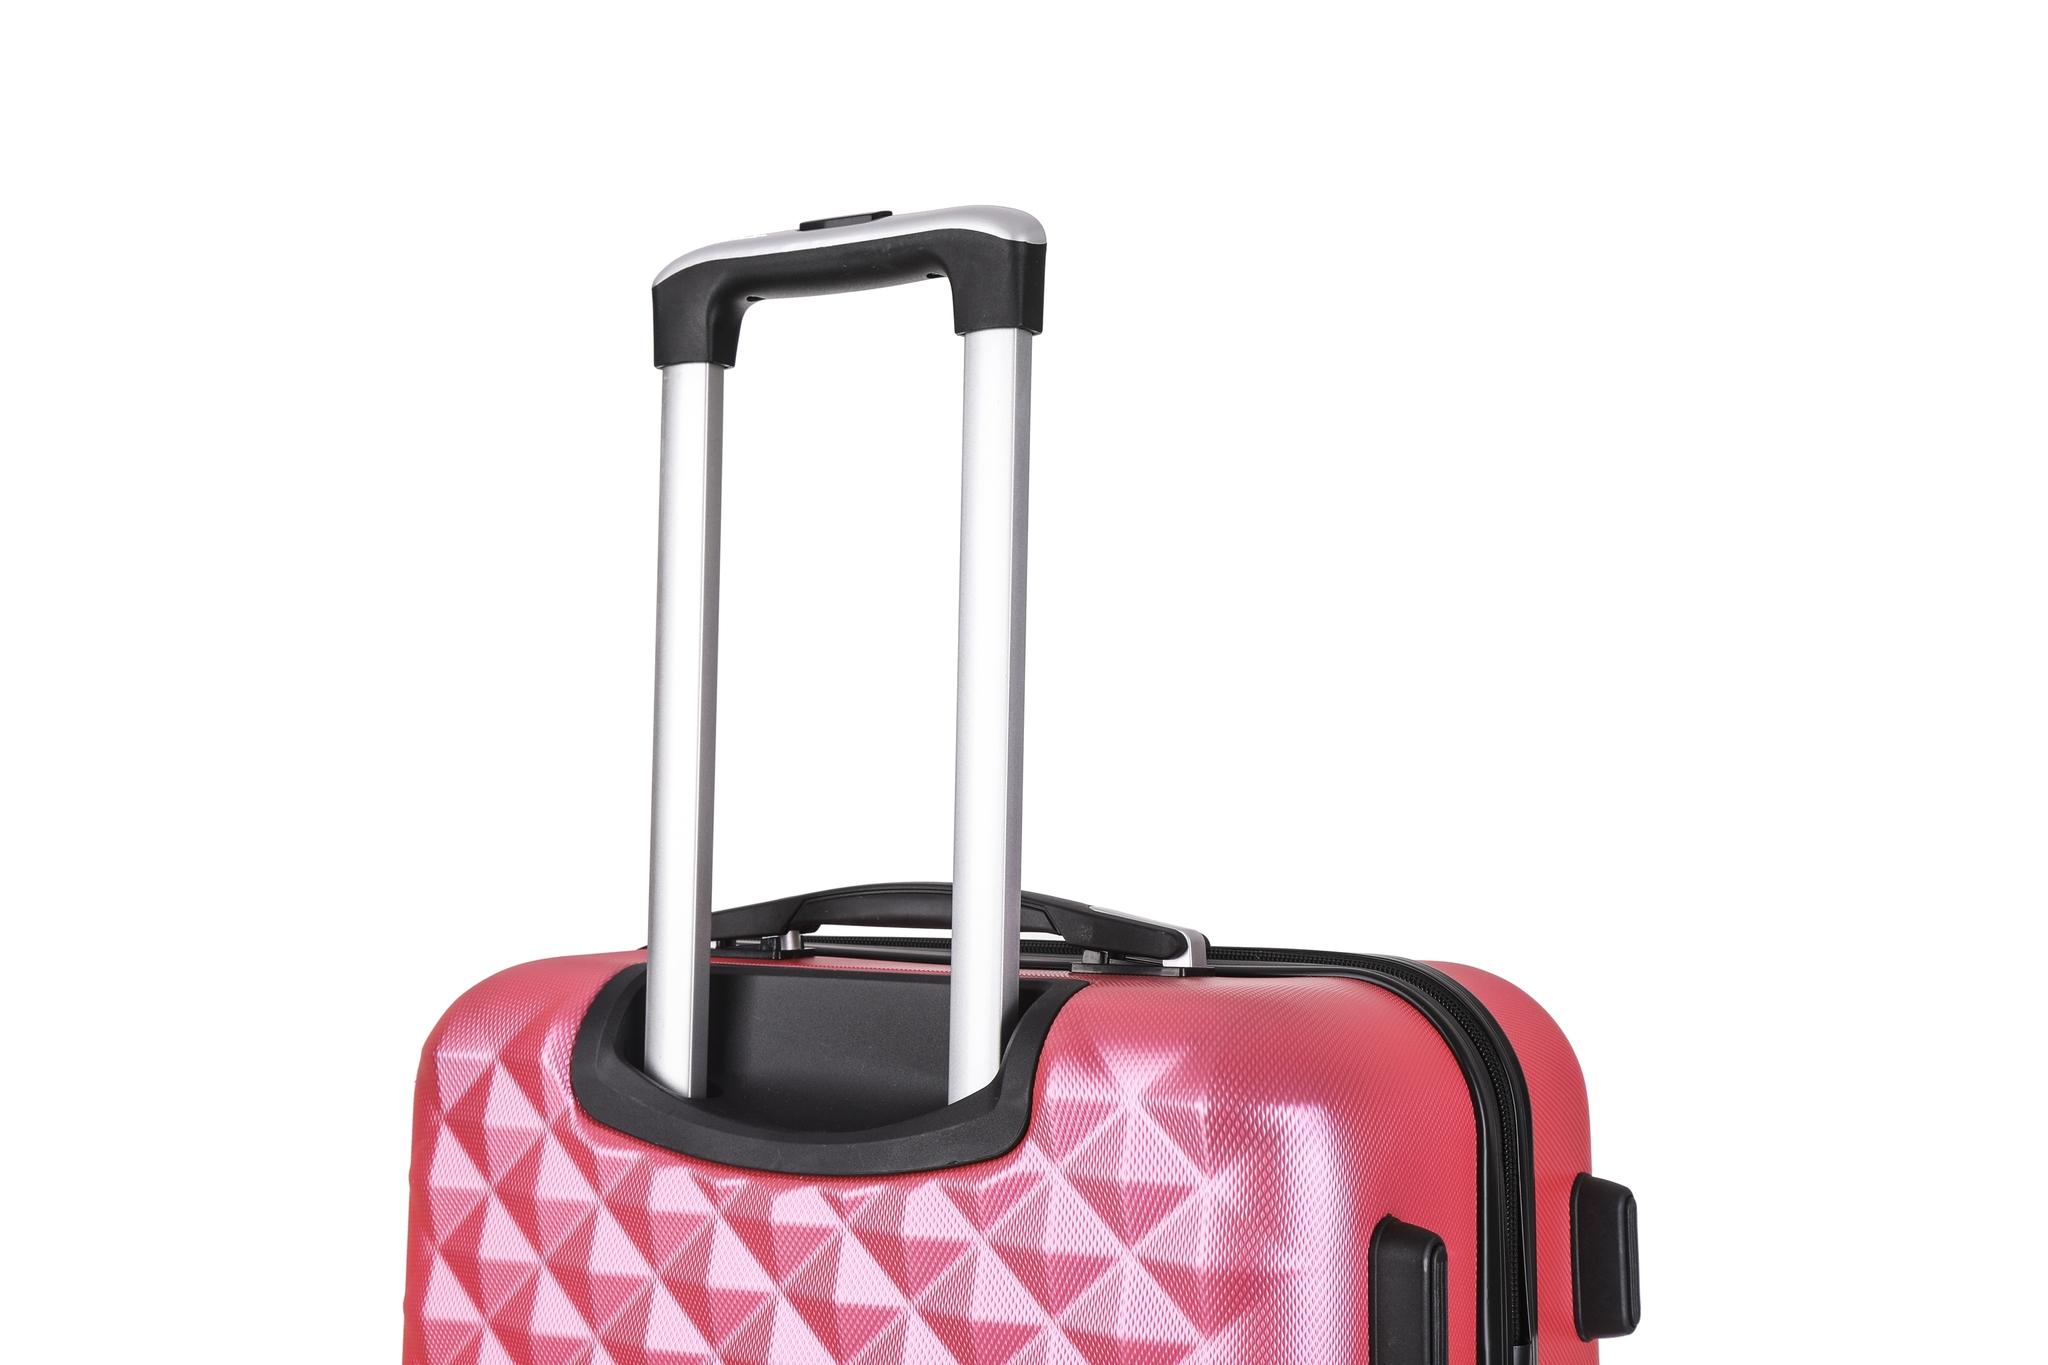 Чемодан со съемными колесами L'case Phatthaya-28 Розовый (L)